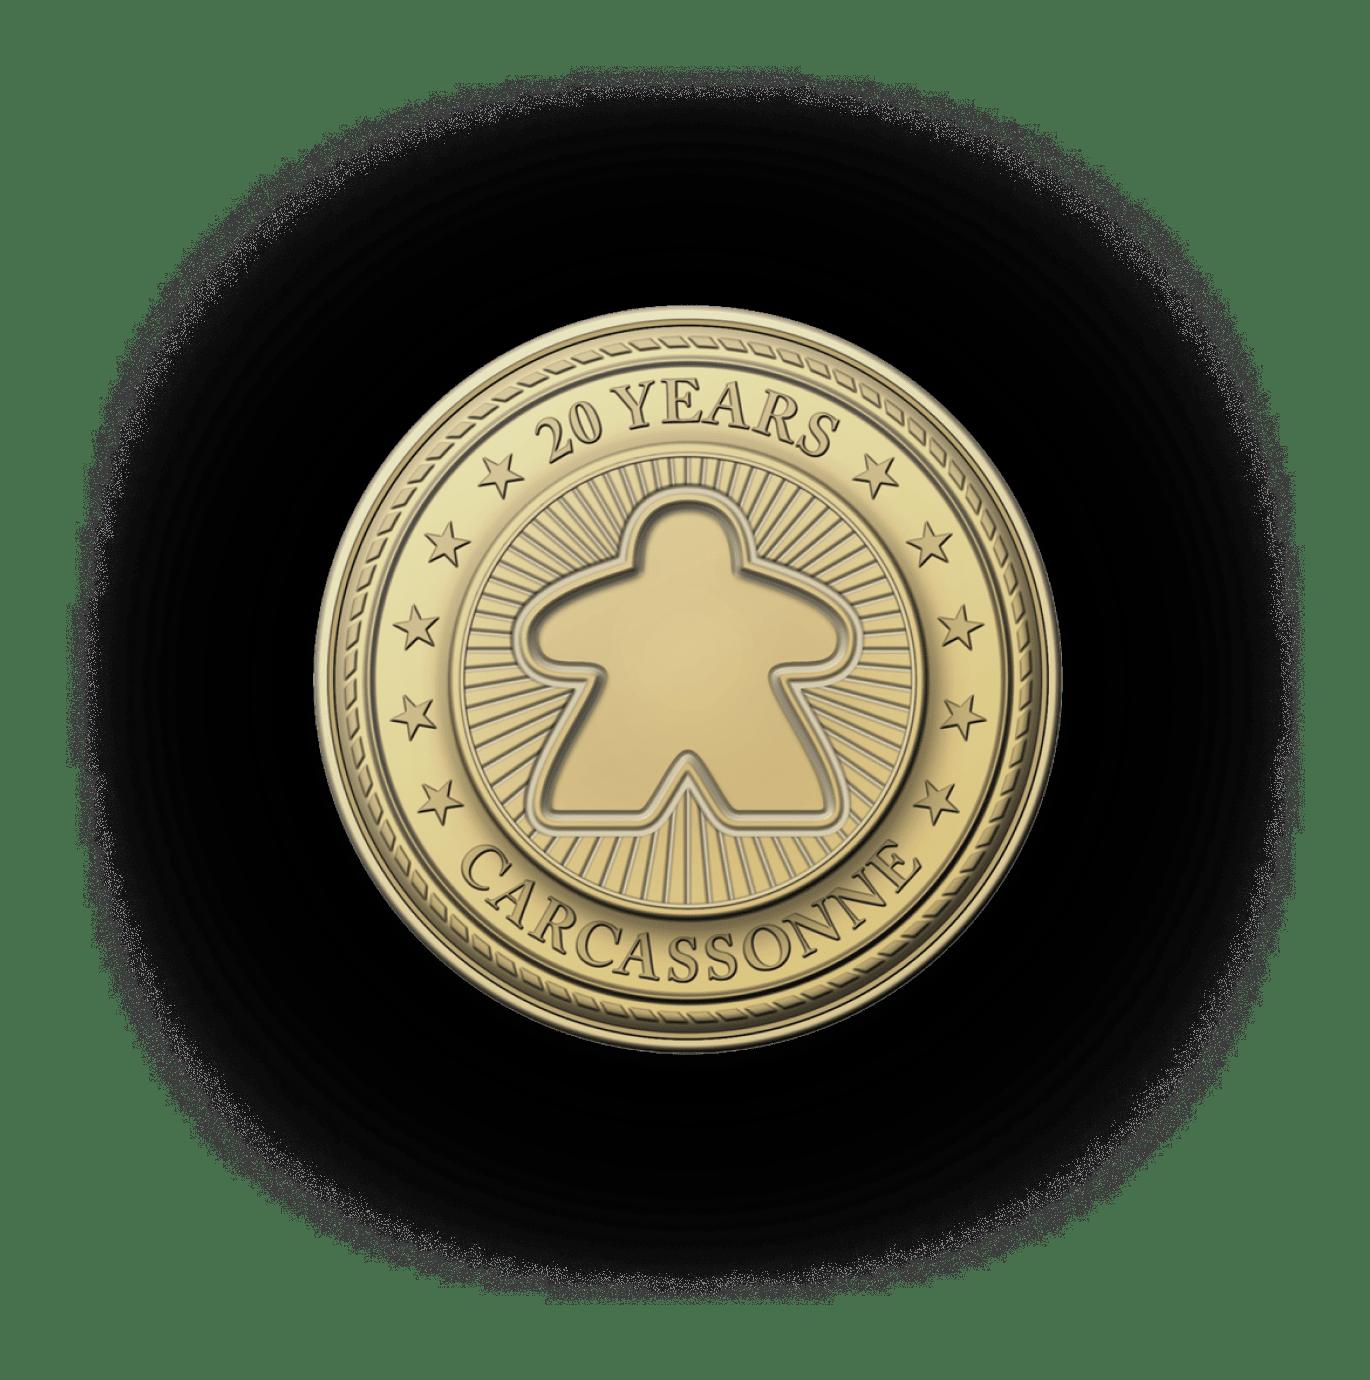 Carcassonne Medal